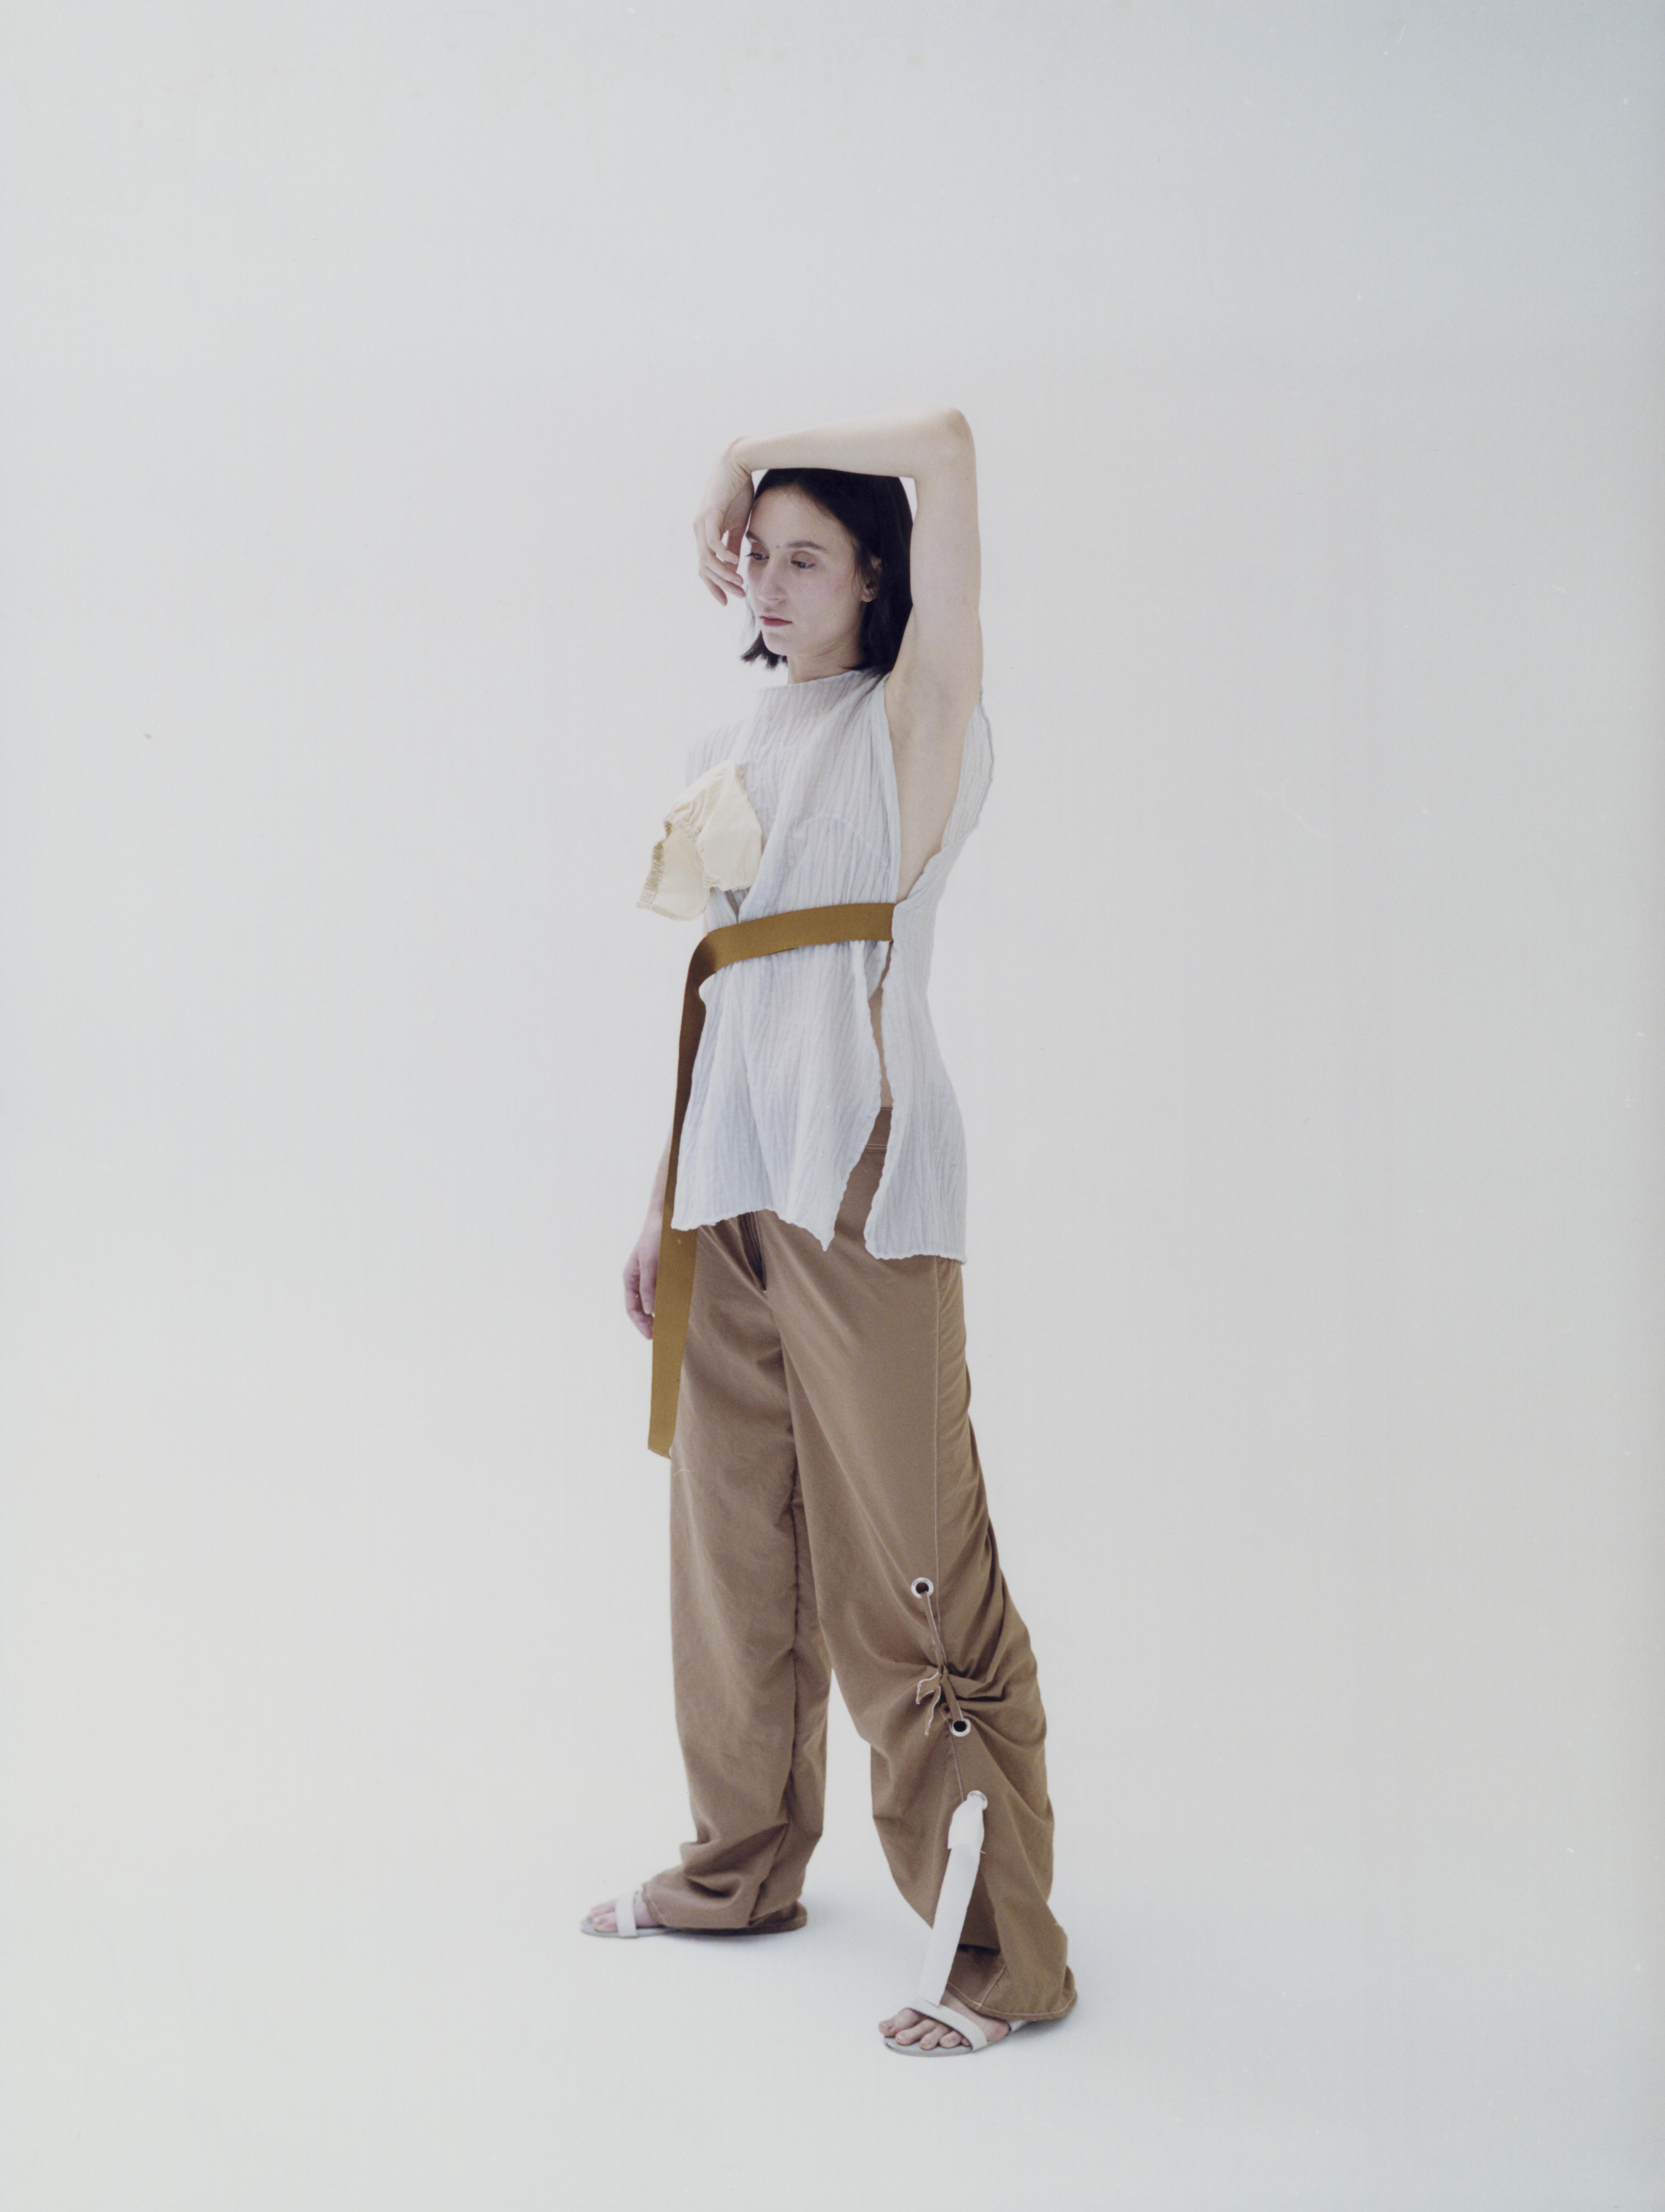 Alysée Yin Chen